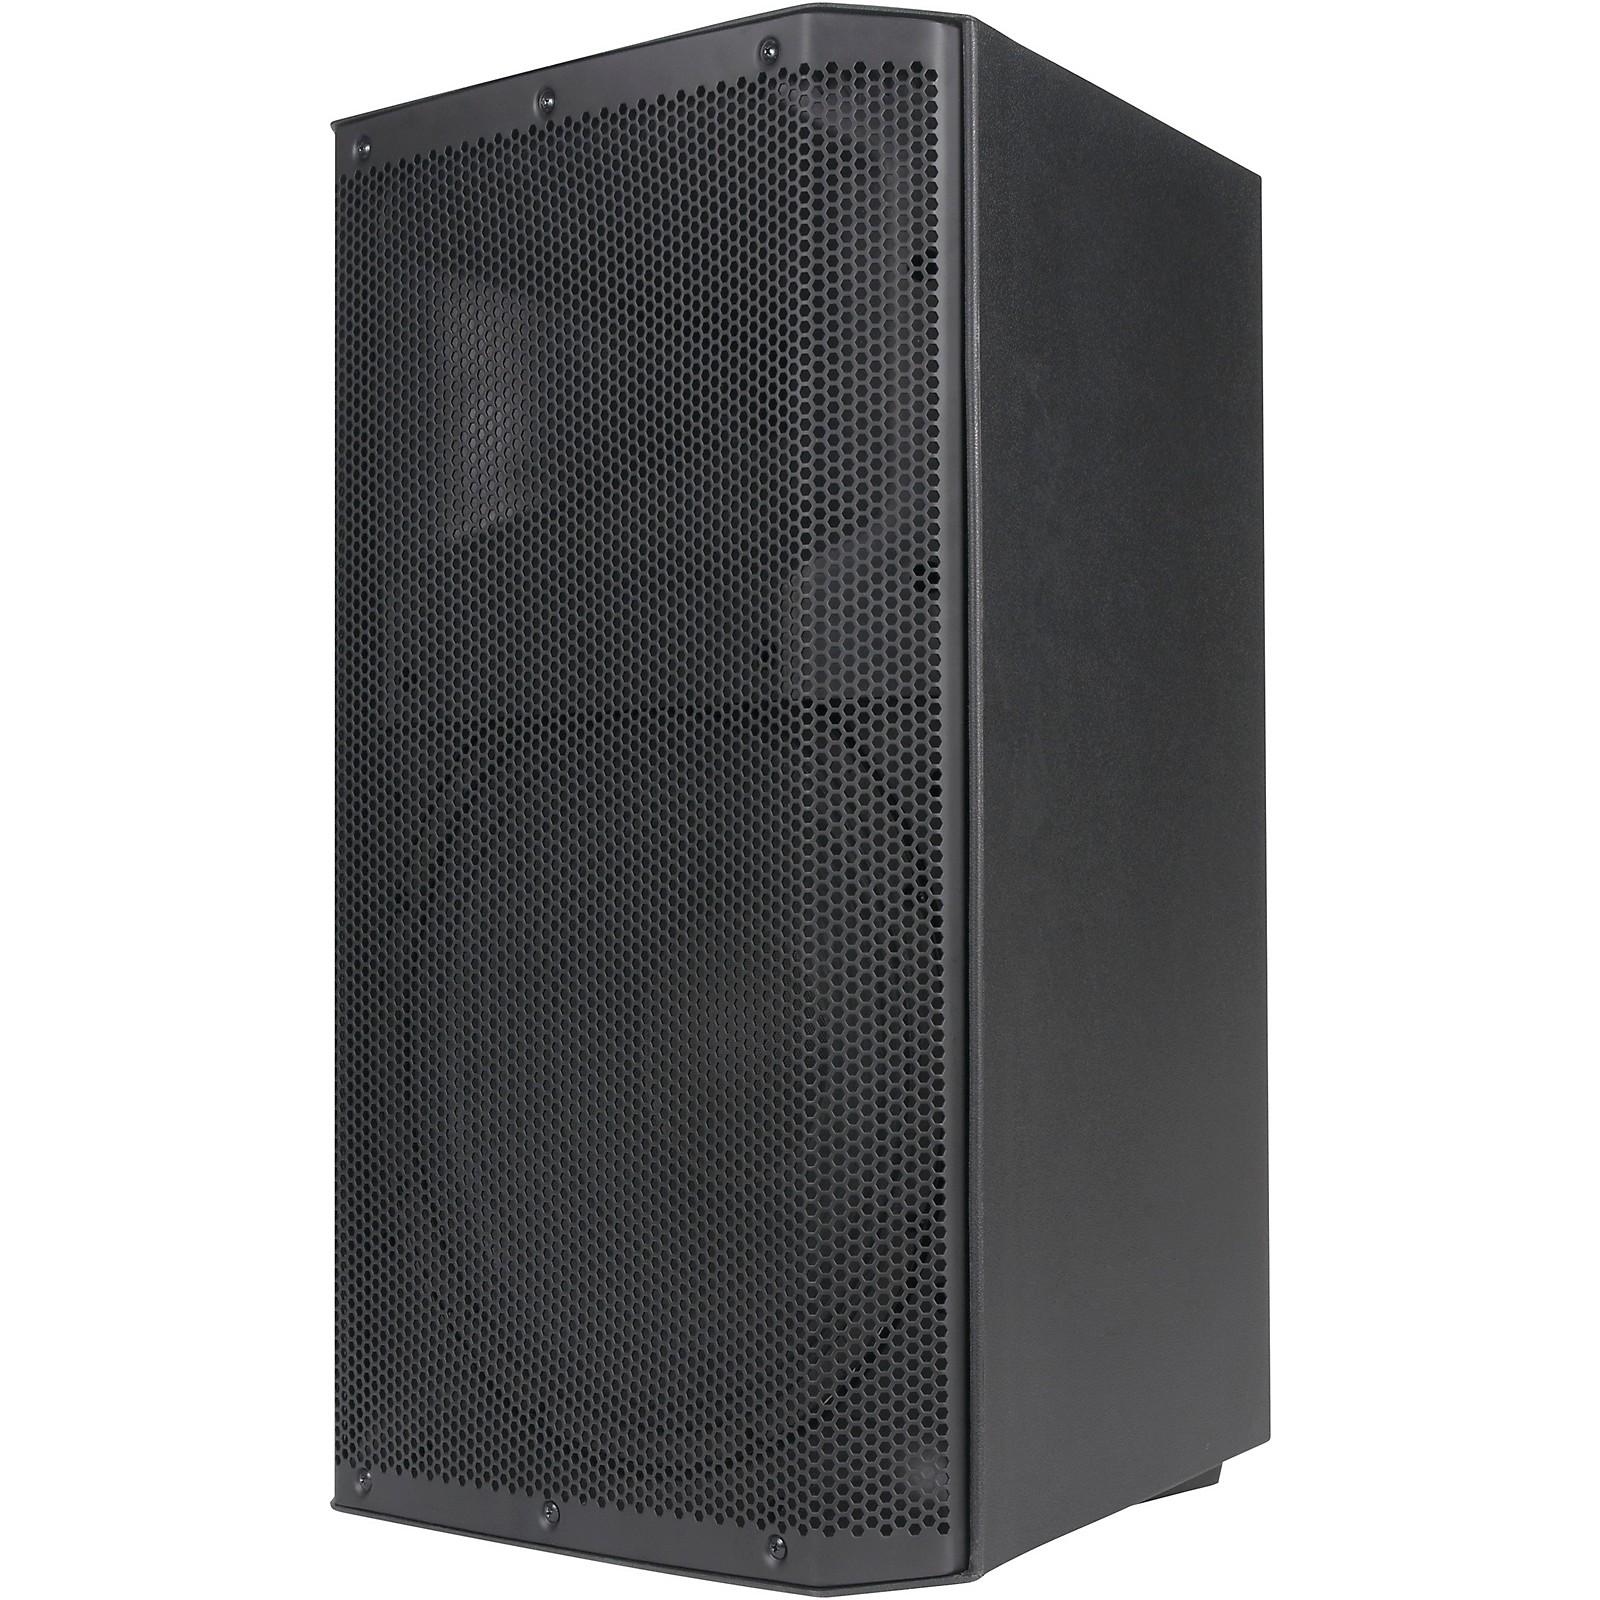 American Audio ATX-15W 15